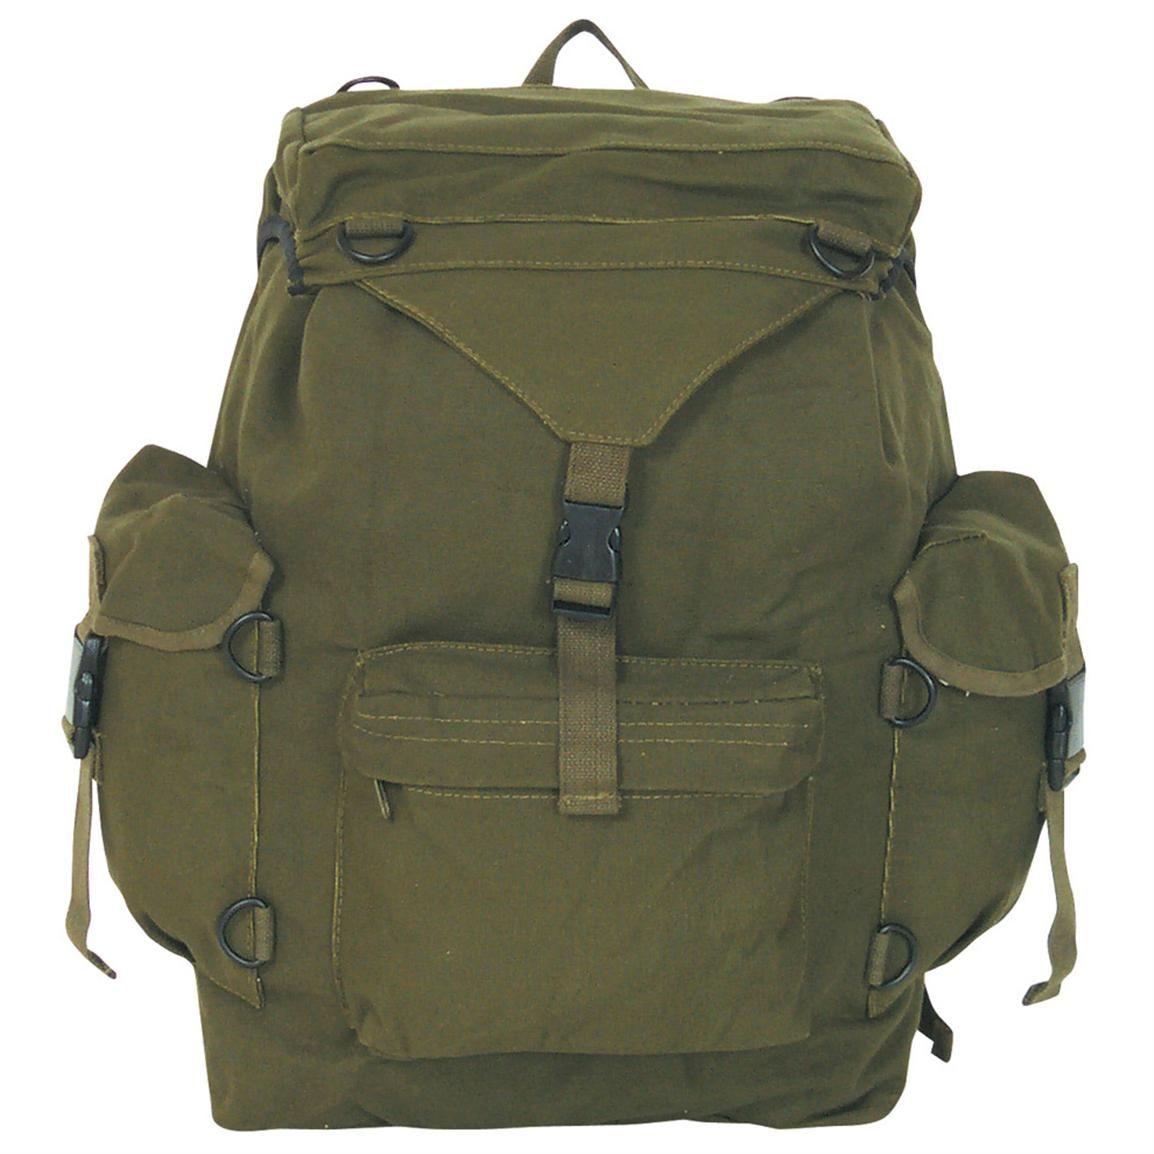 Fox Outdoor™ Australian Military-style Backpack 3b0b7e77e49c0